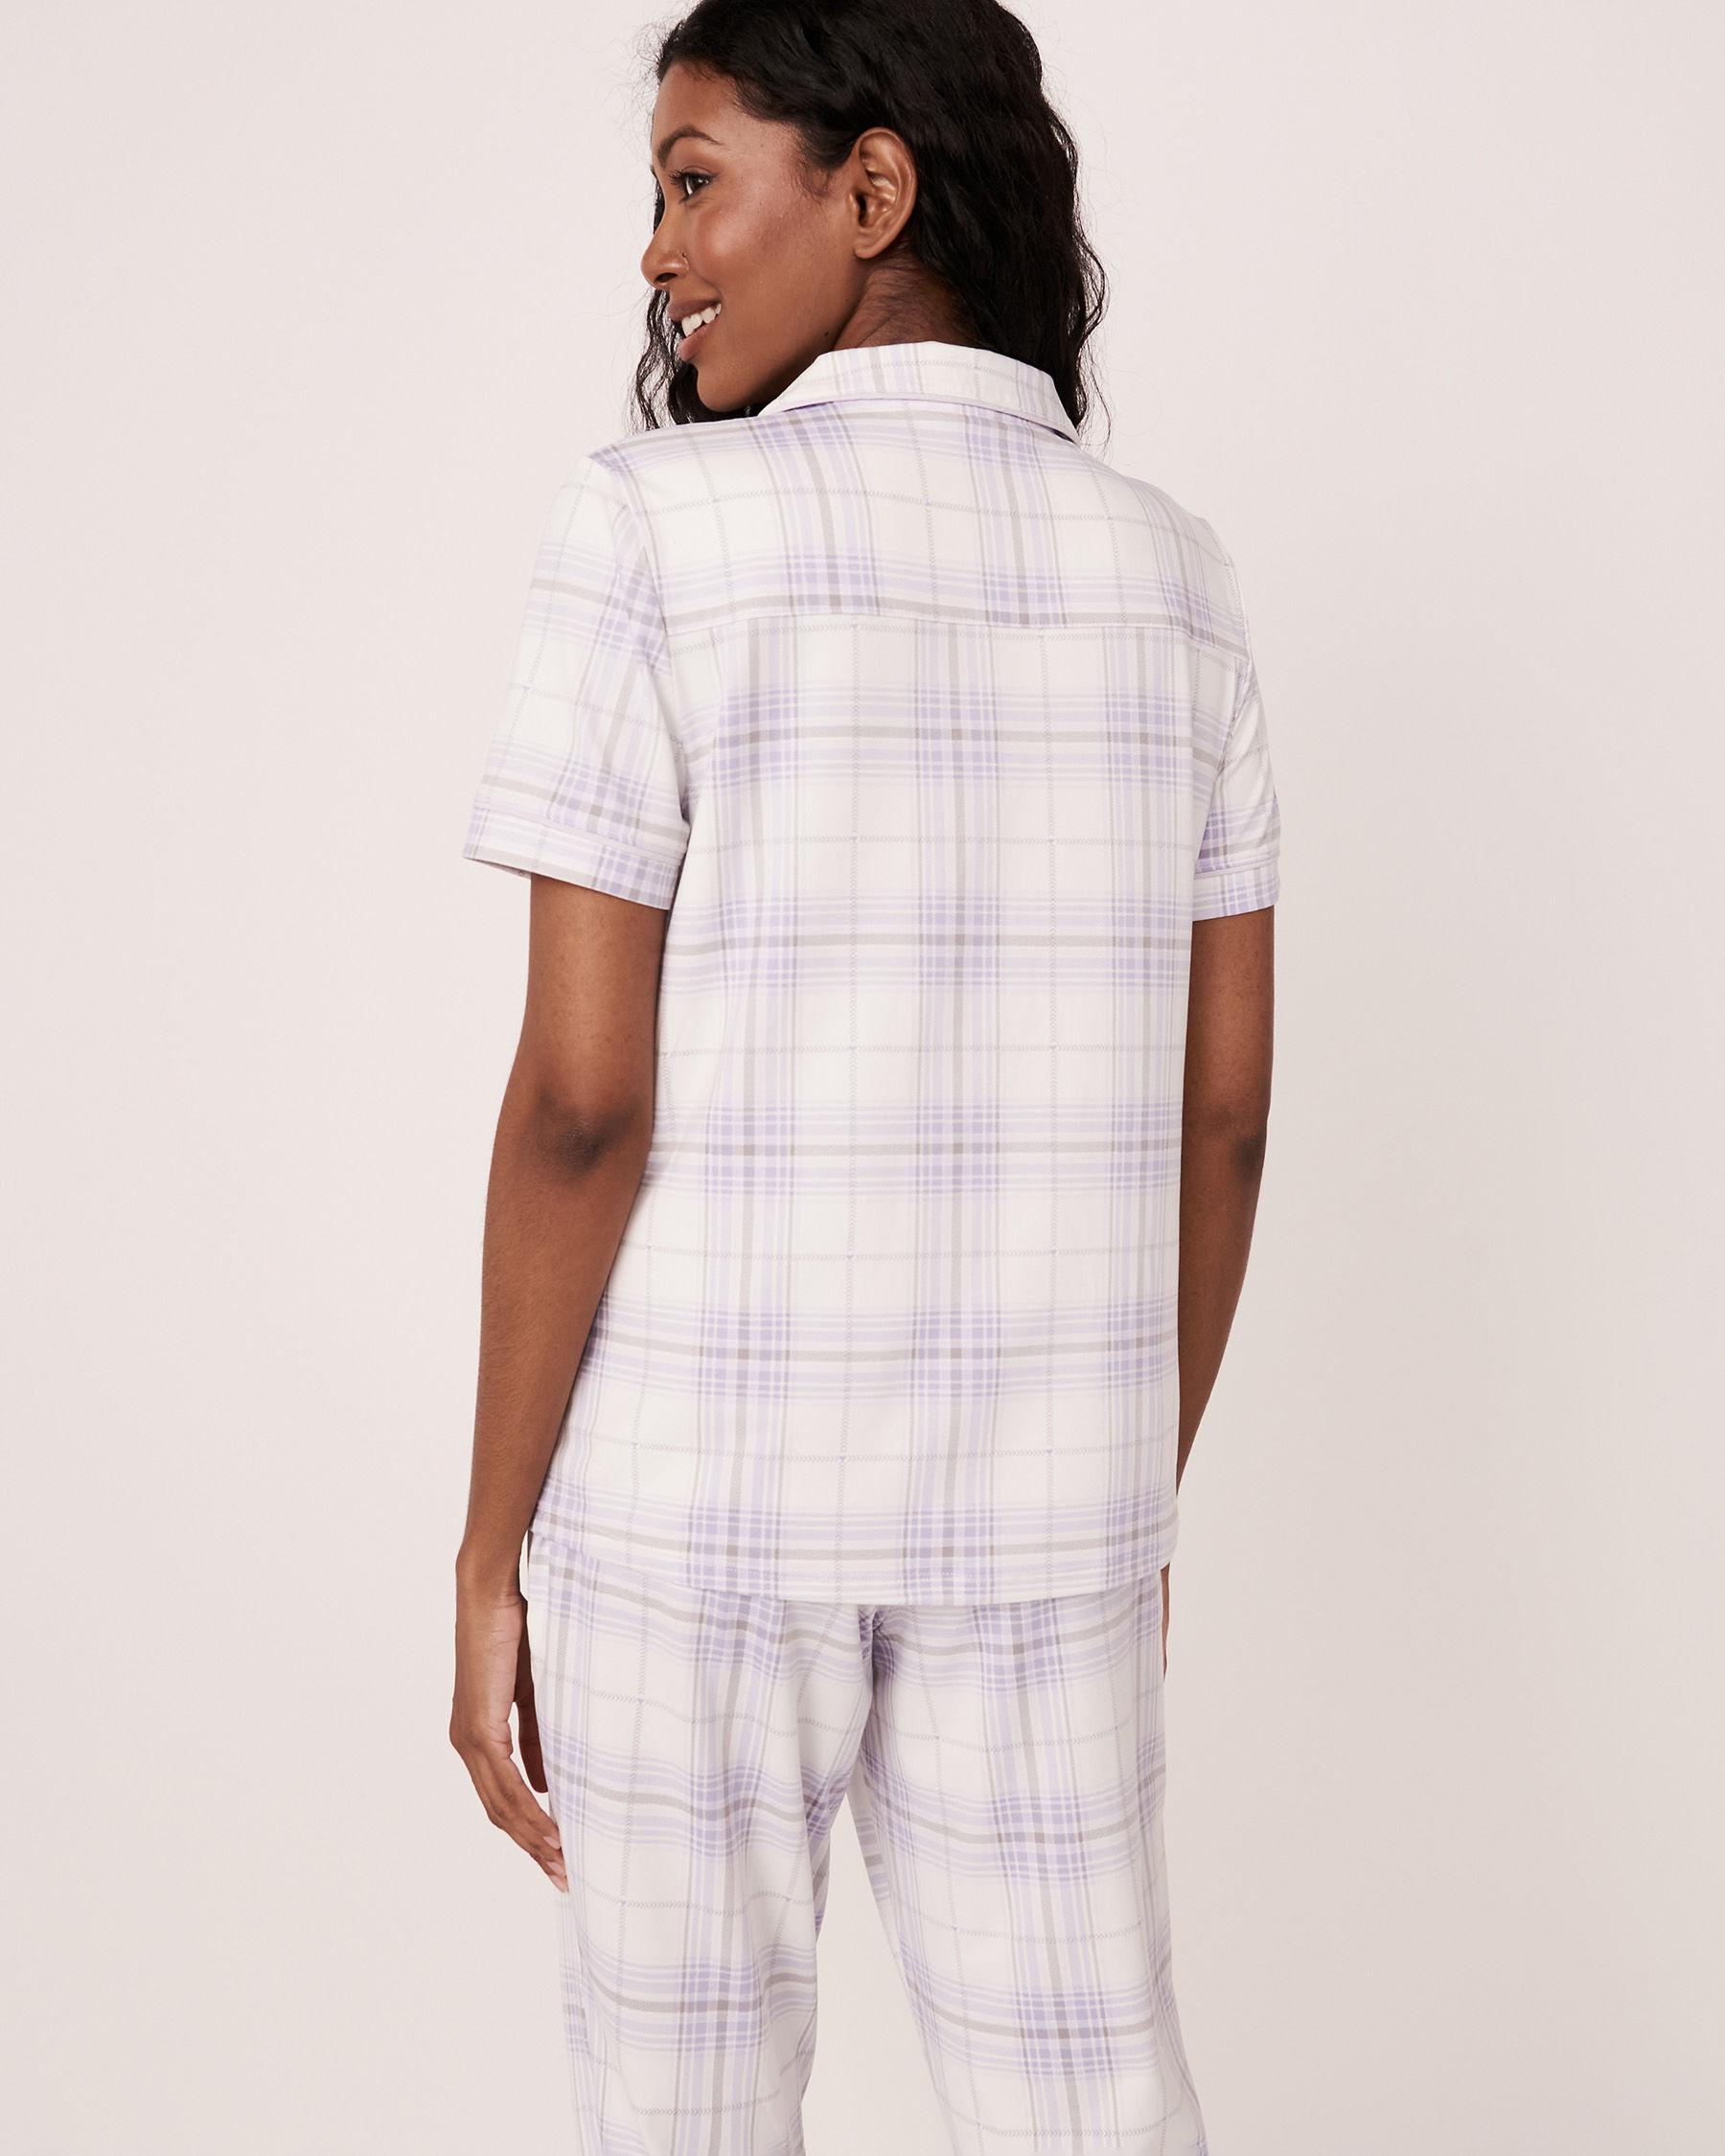 LA VIE EN ROSE Short Sleeve Shirt Plaid 40100147 - View2